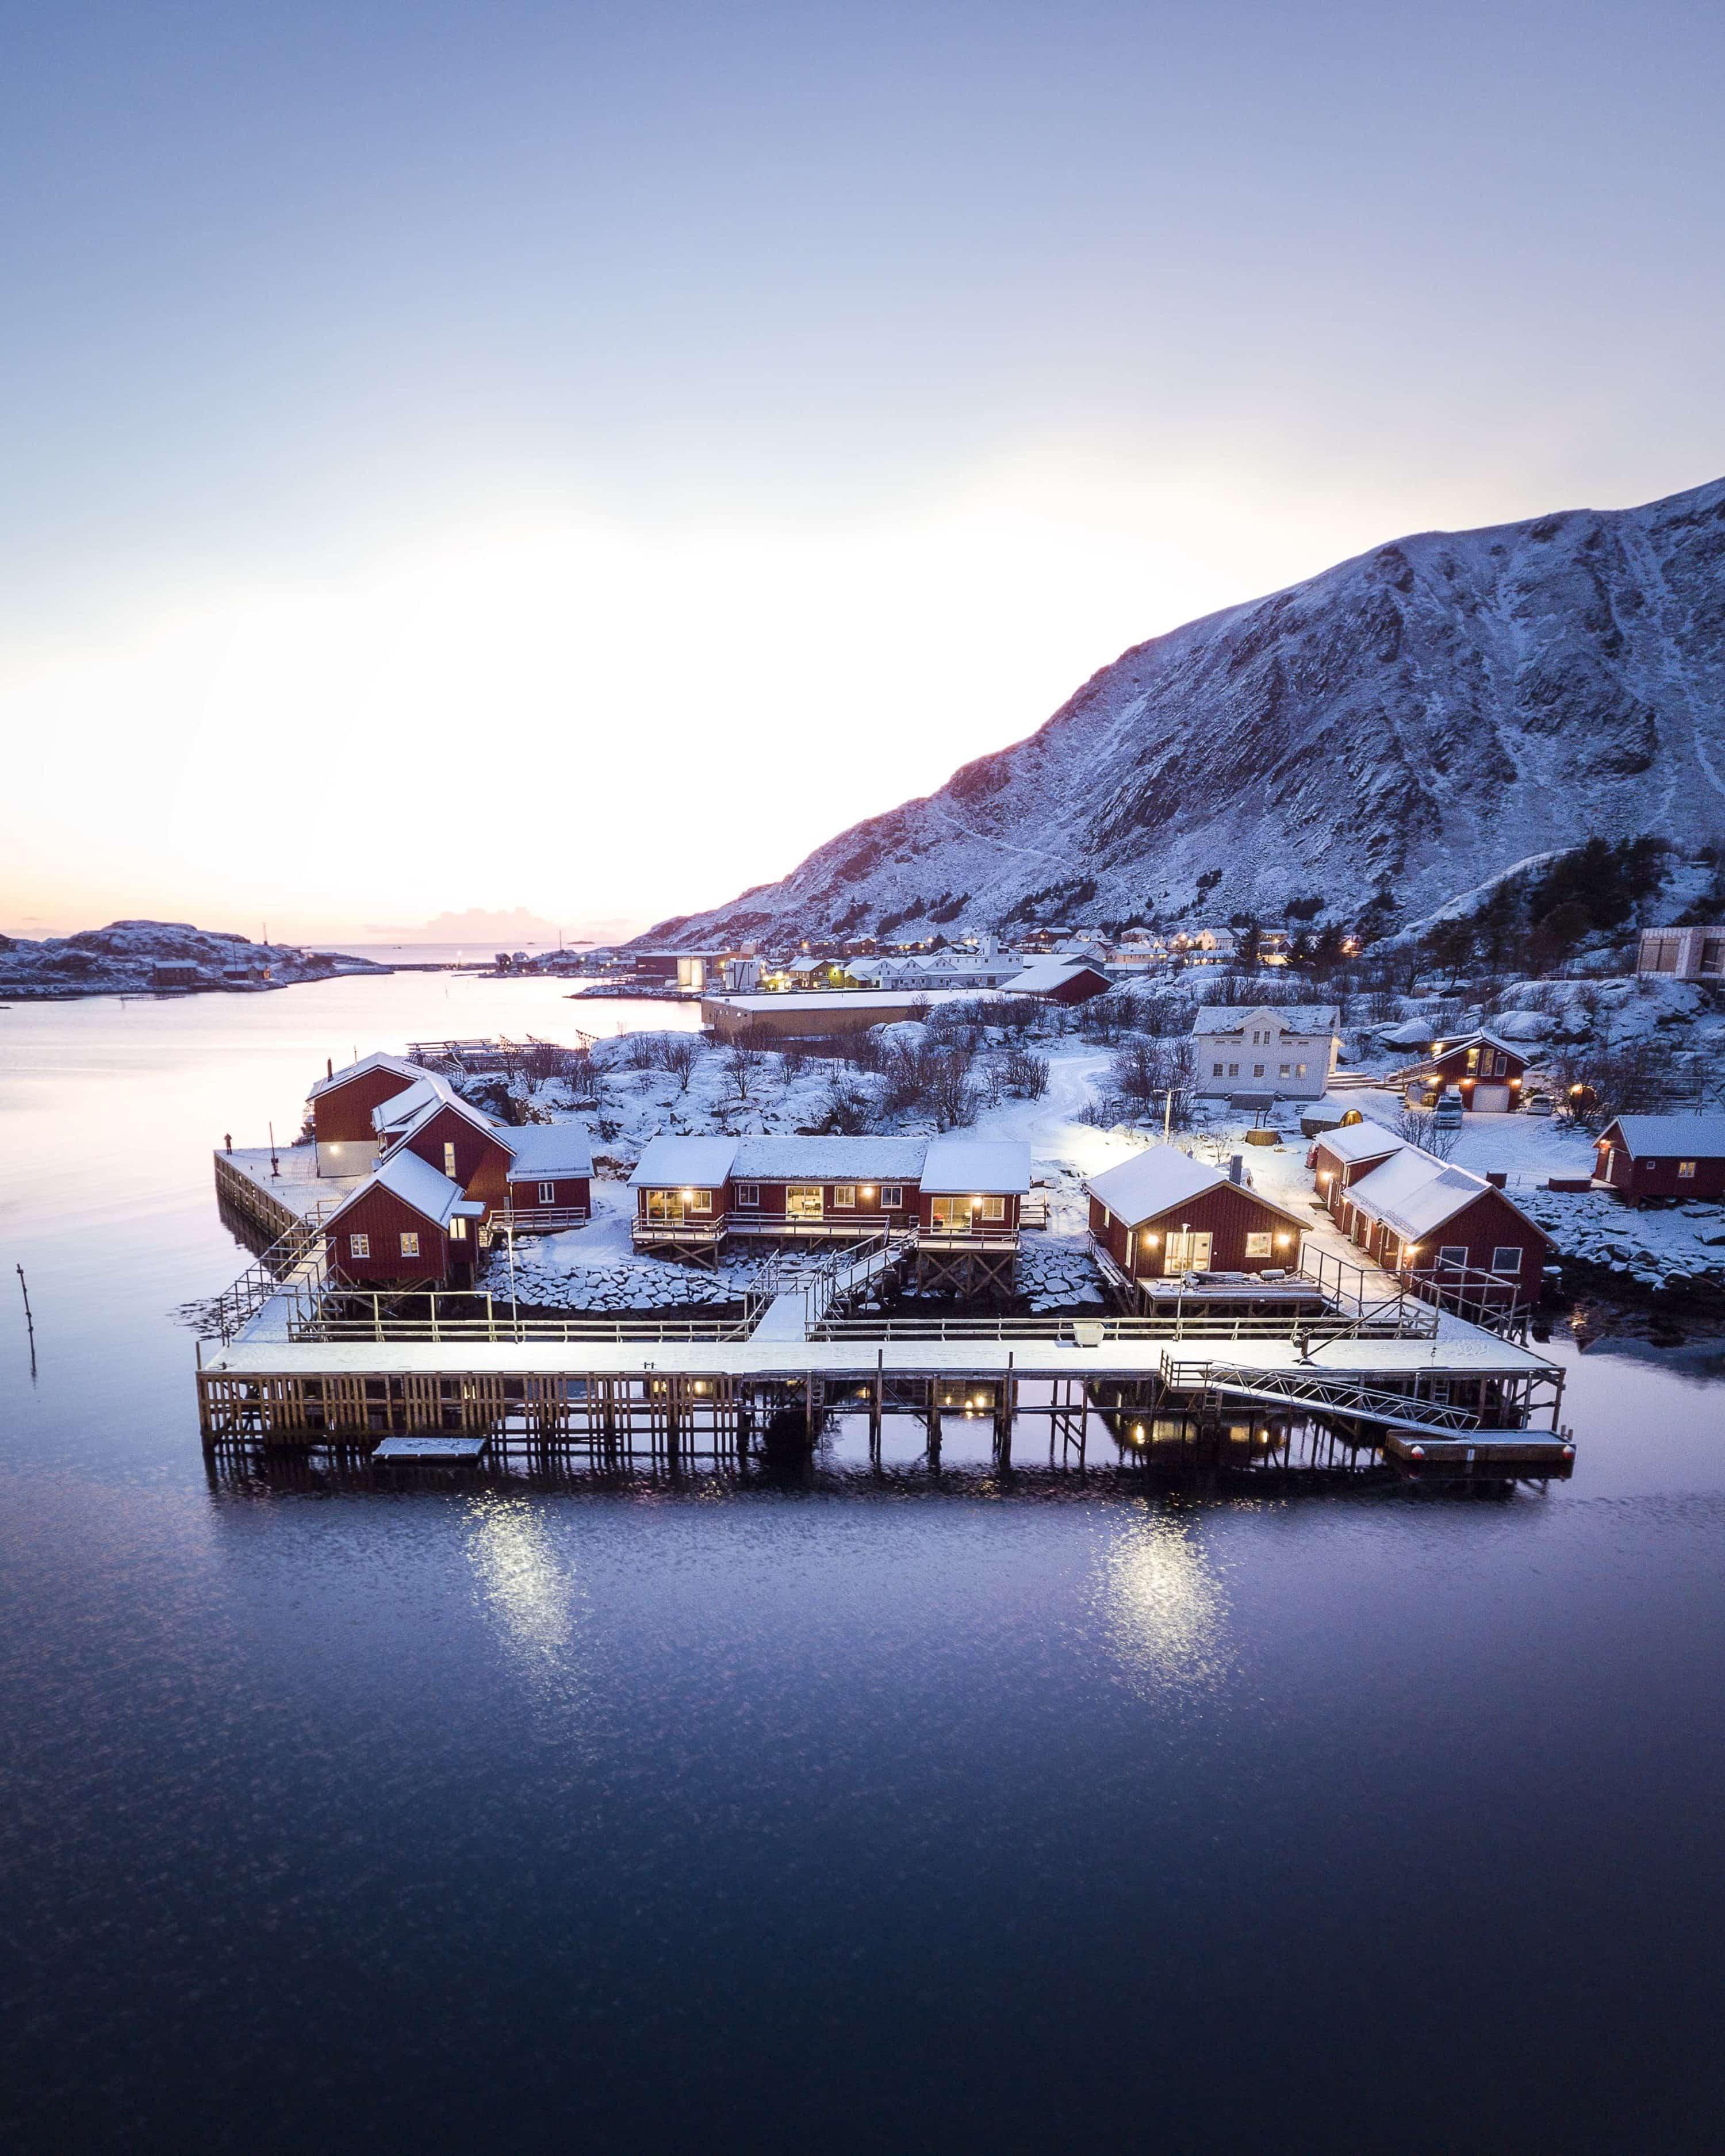 Overview of Hattvika Lodge in the Lofoten islands